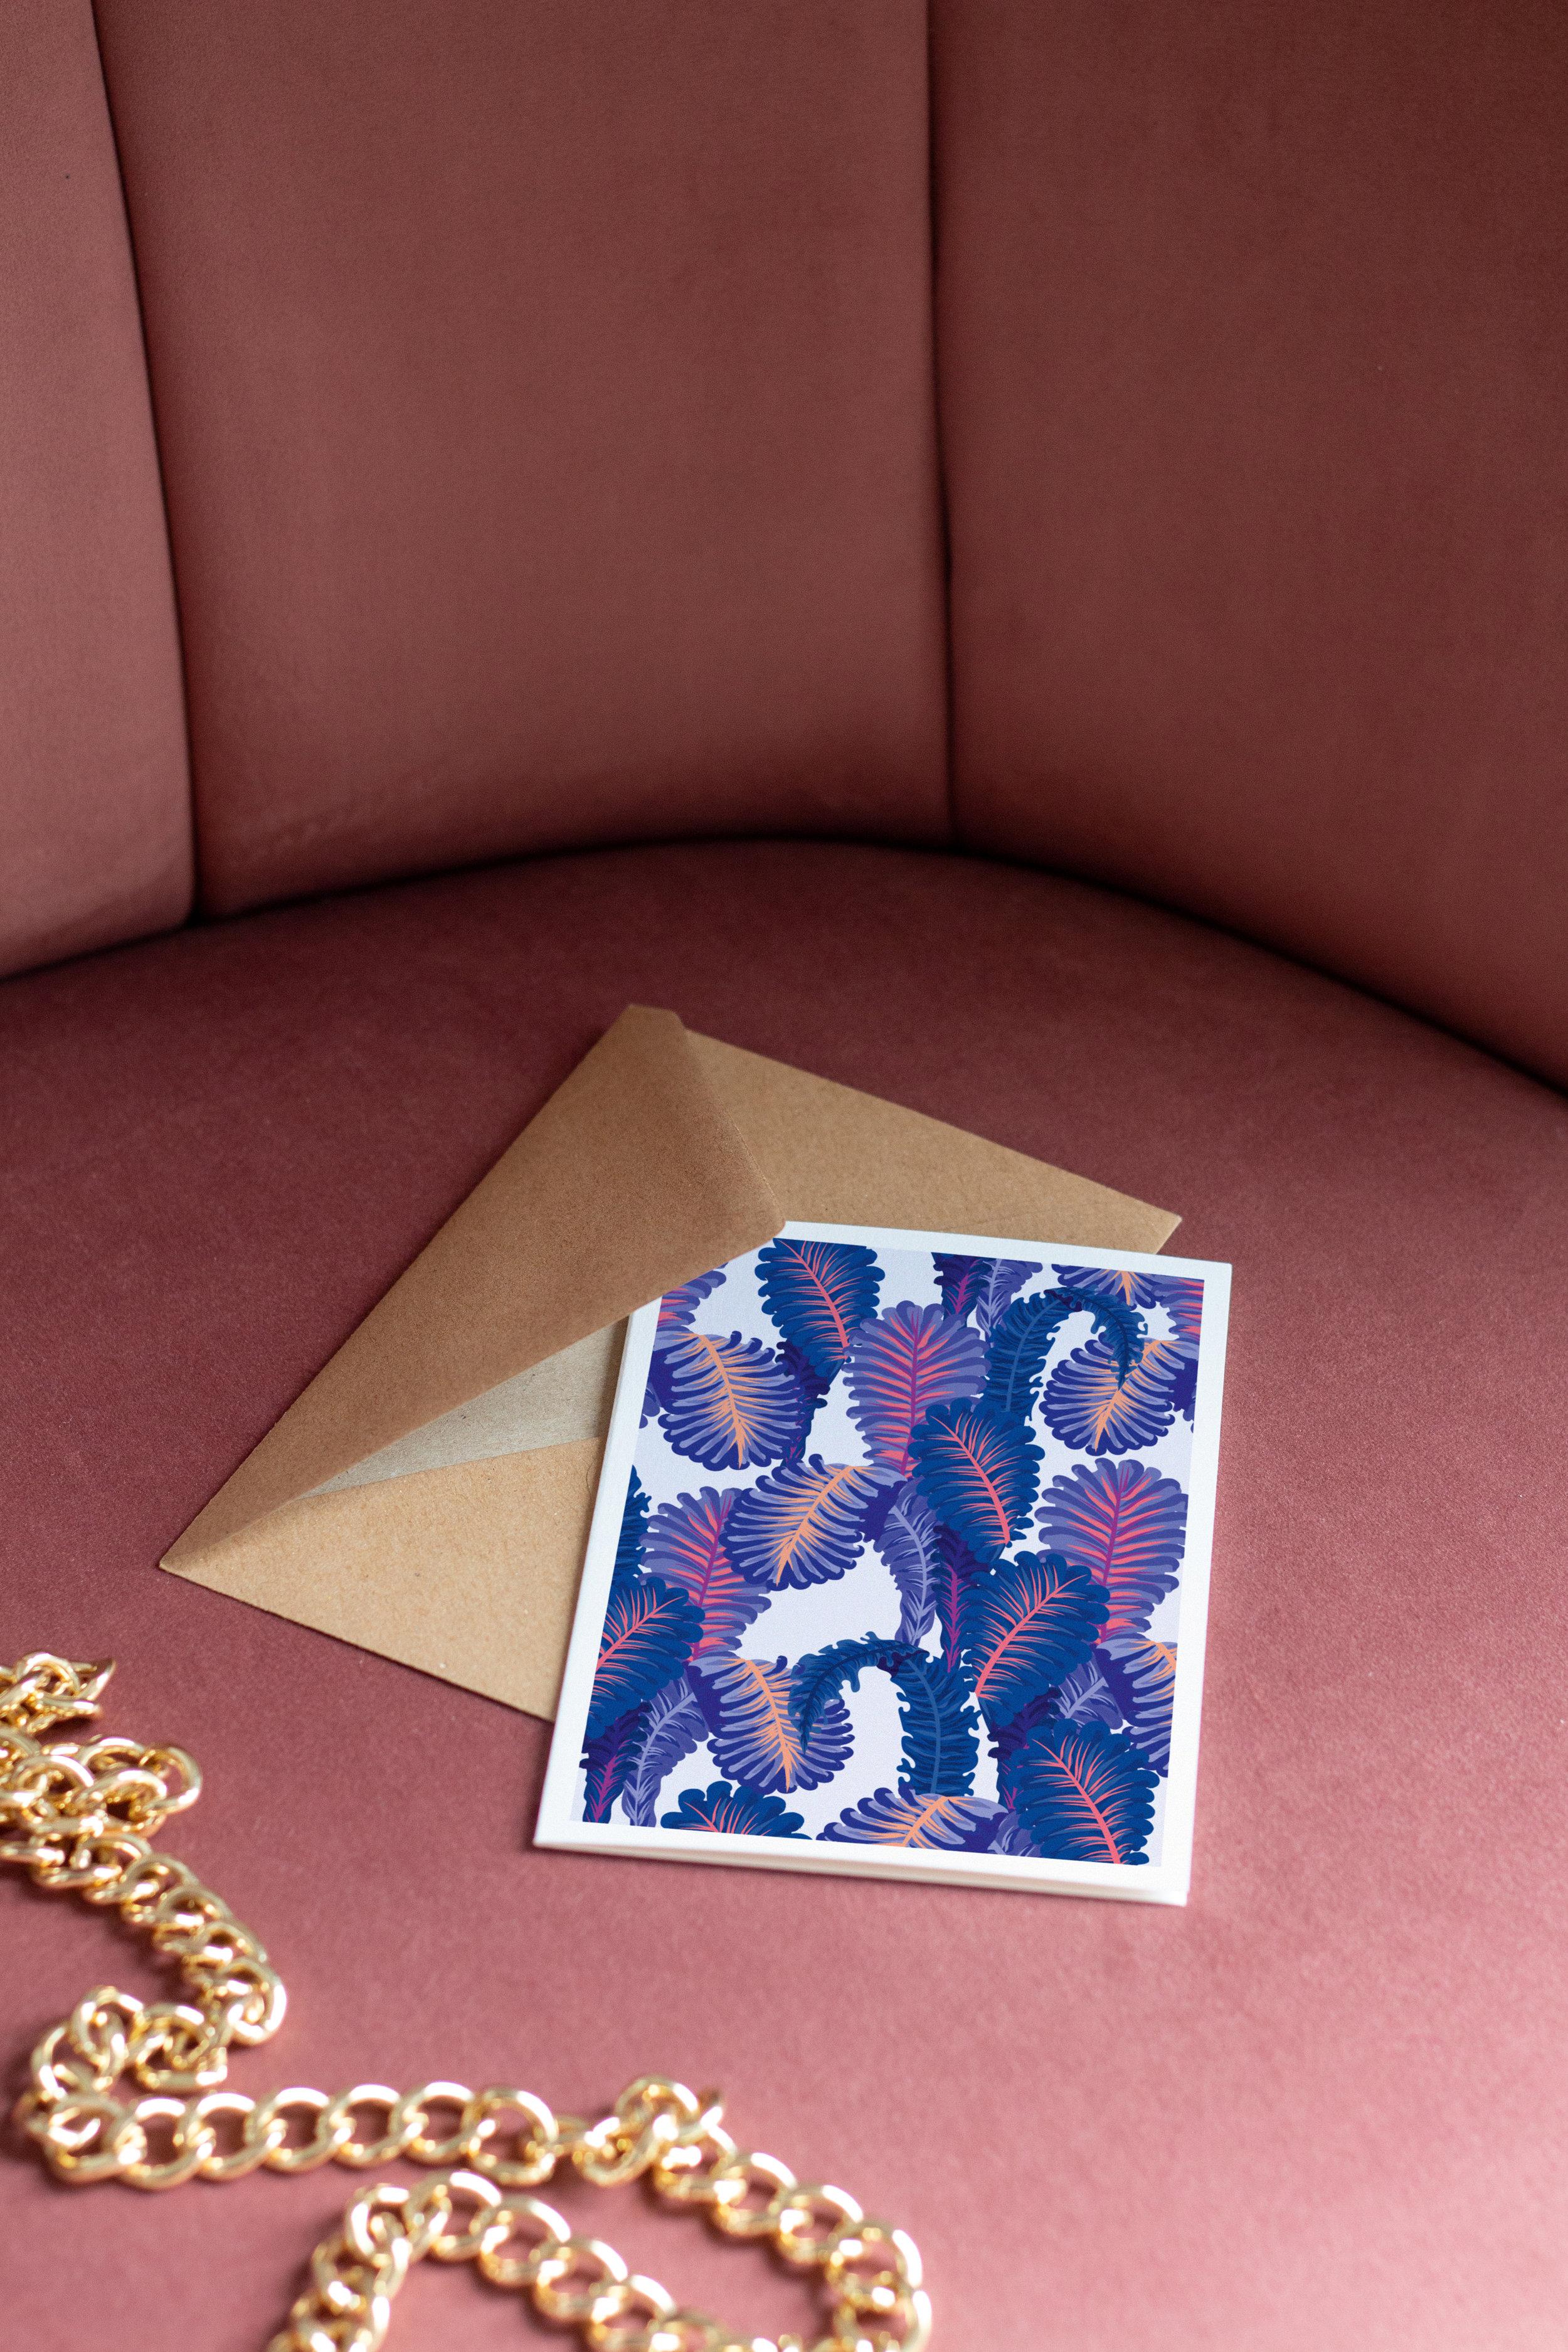 carte-postale-motif-algues-marines